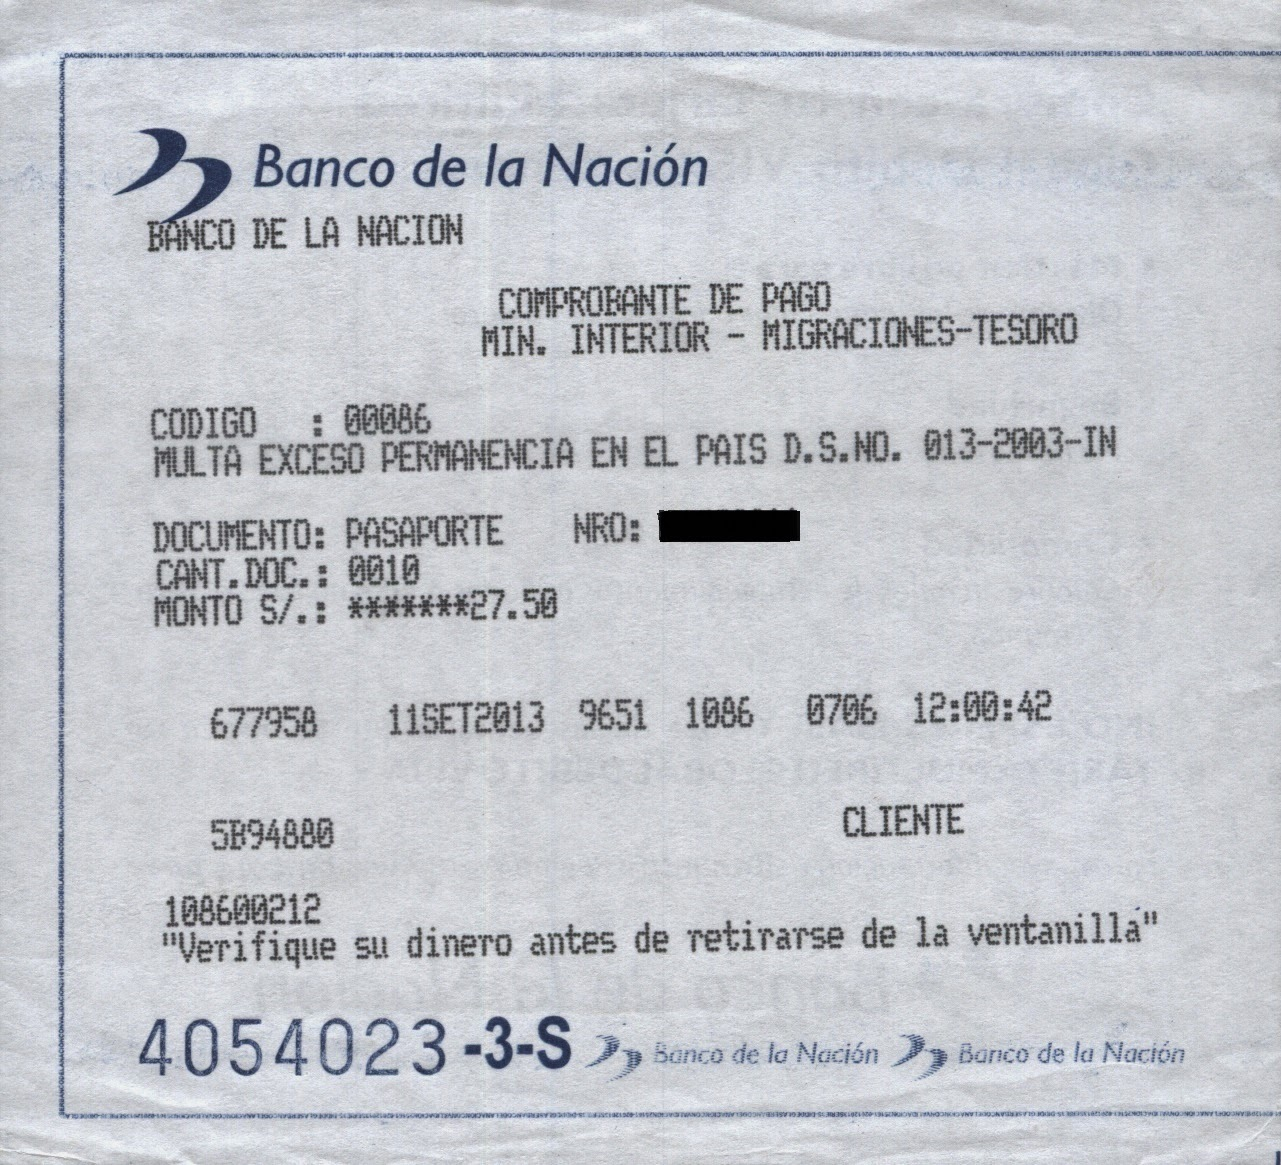 SOAT - Seguro obrigatório. Peru.]